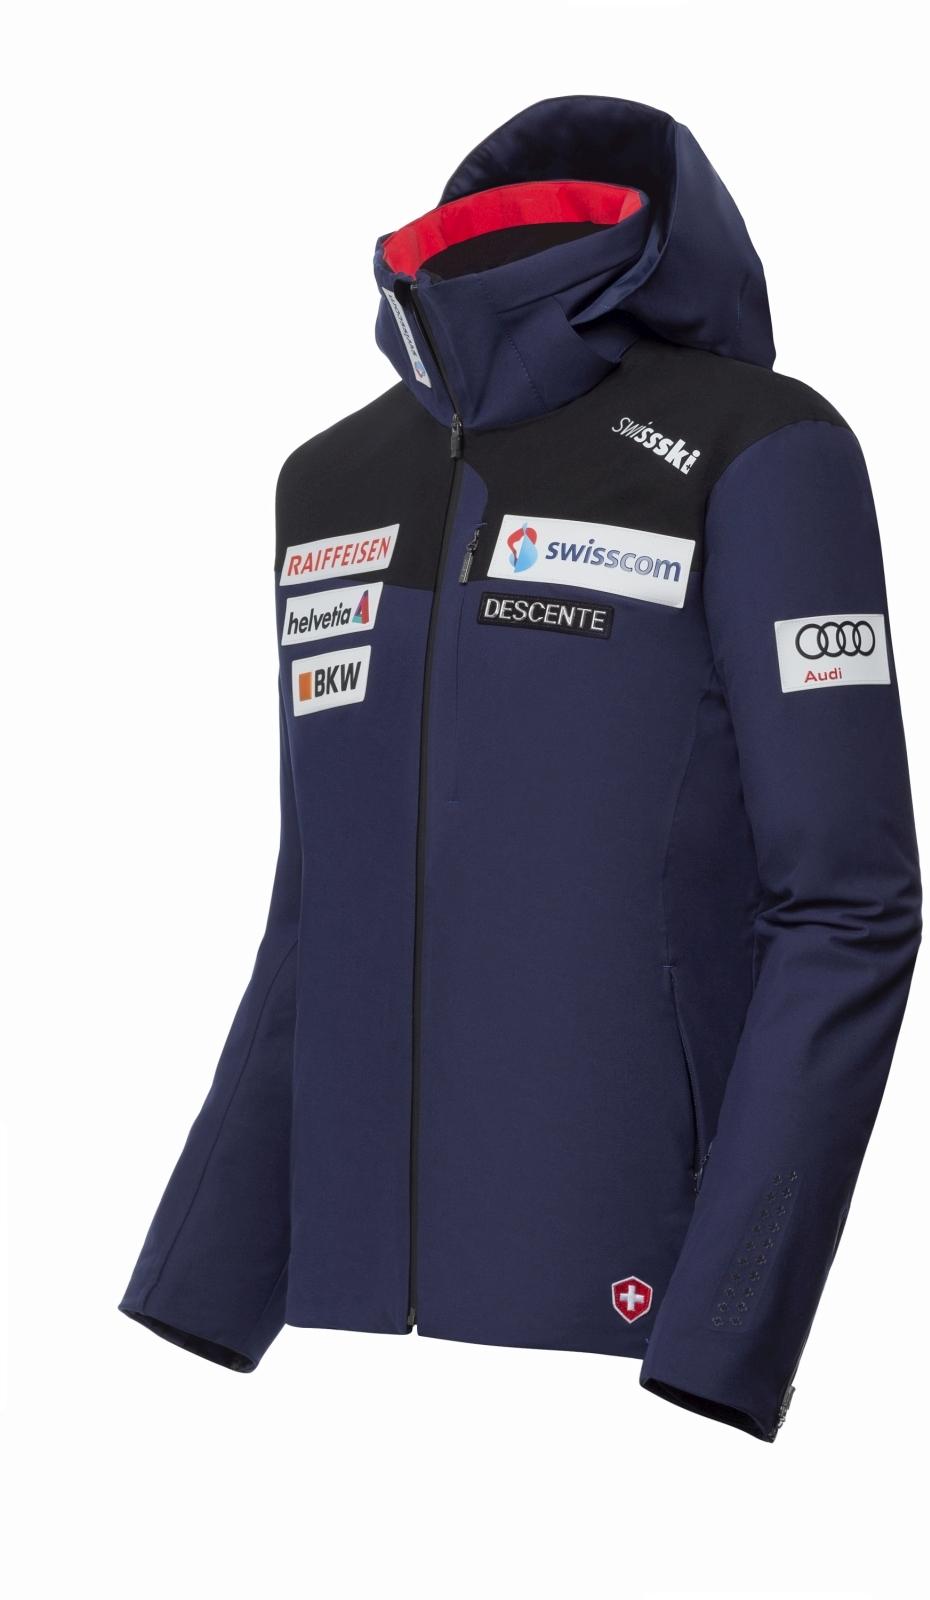 Descente Swiss Ski Replica - dark night M